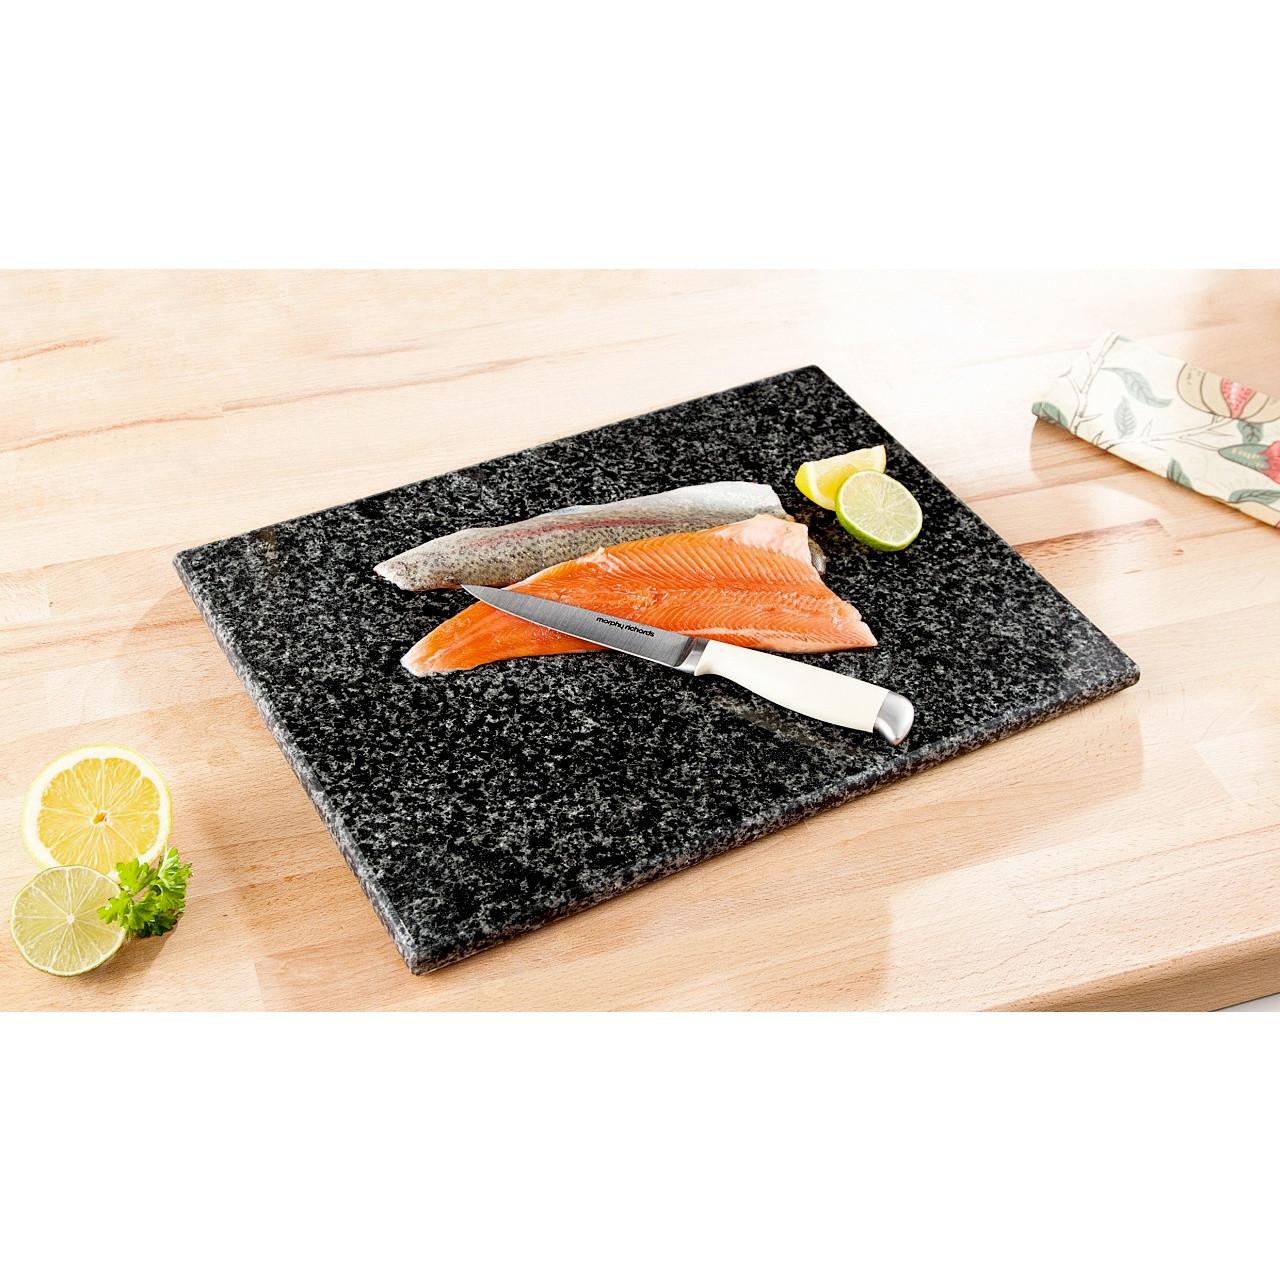 Granite Chopping Board Scotts Of Stow